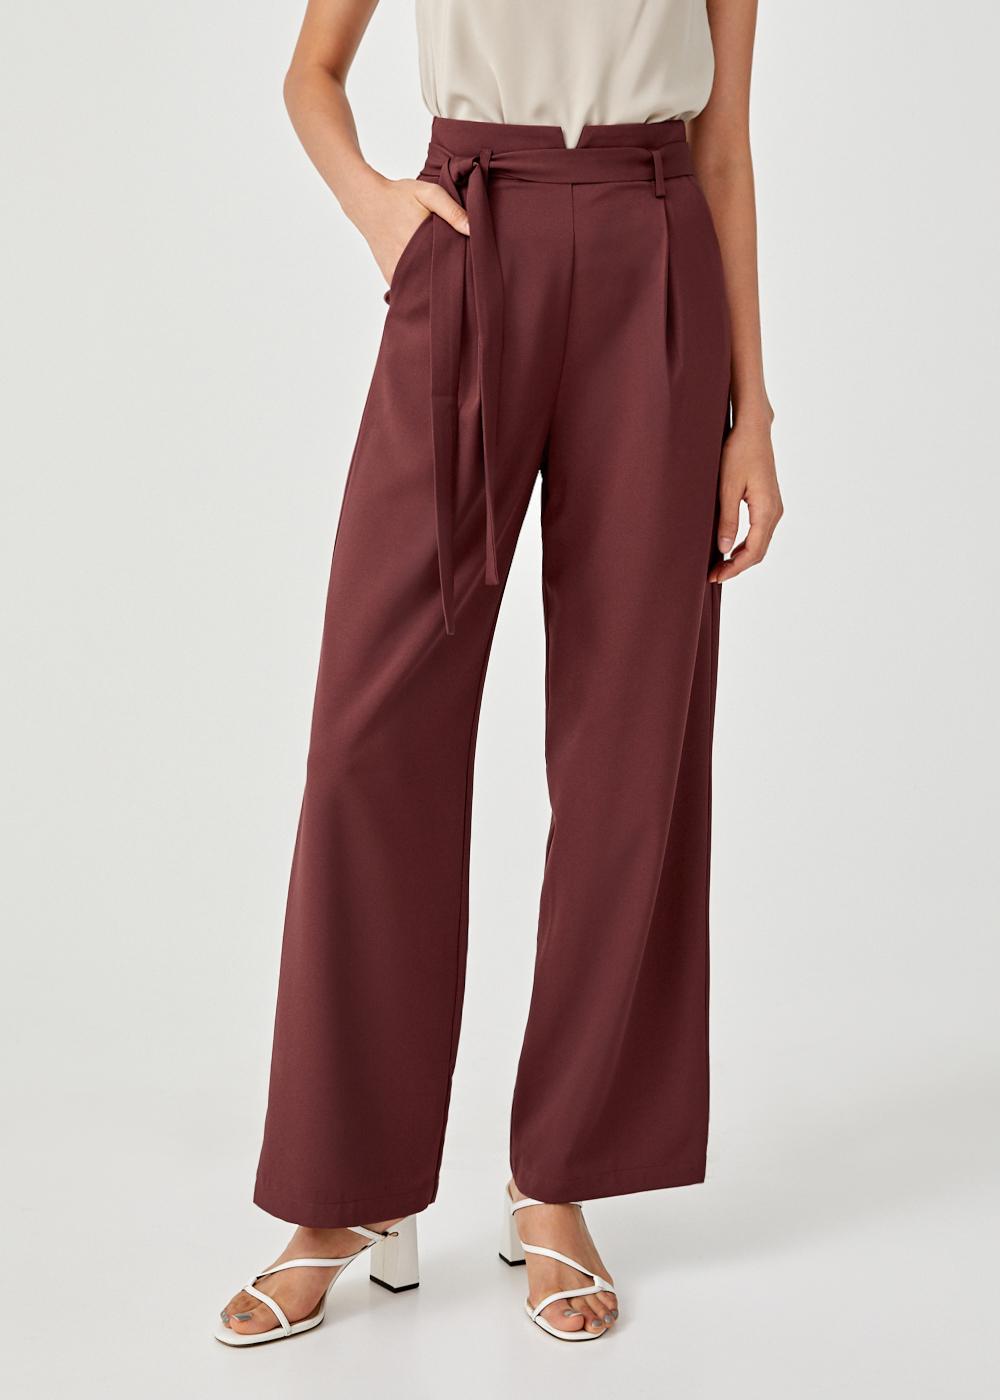 Ambrosia Sash Tie Pants